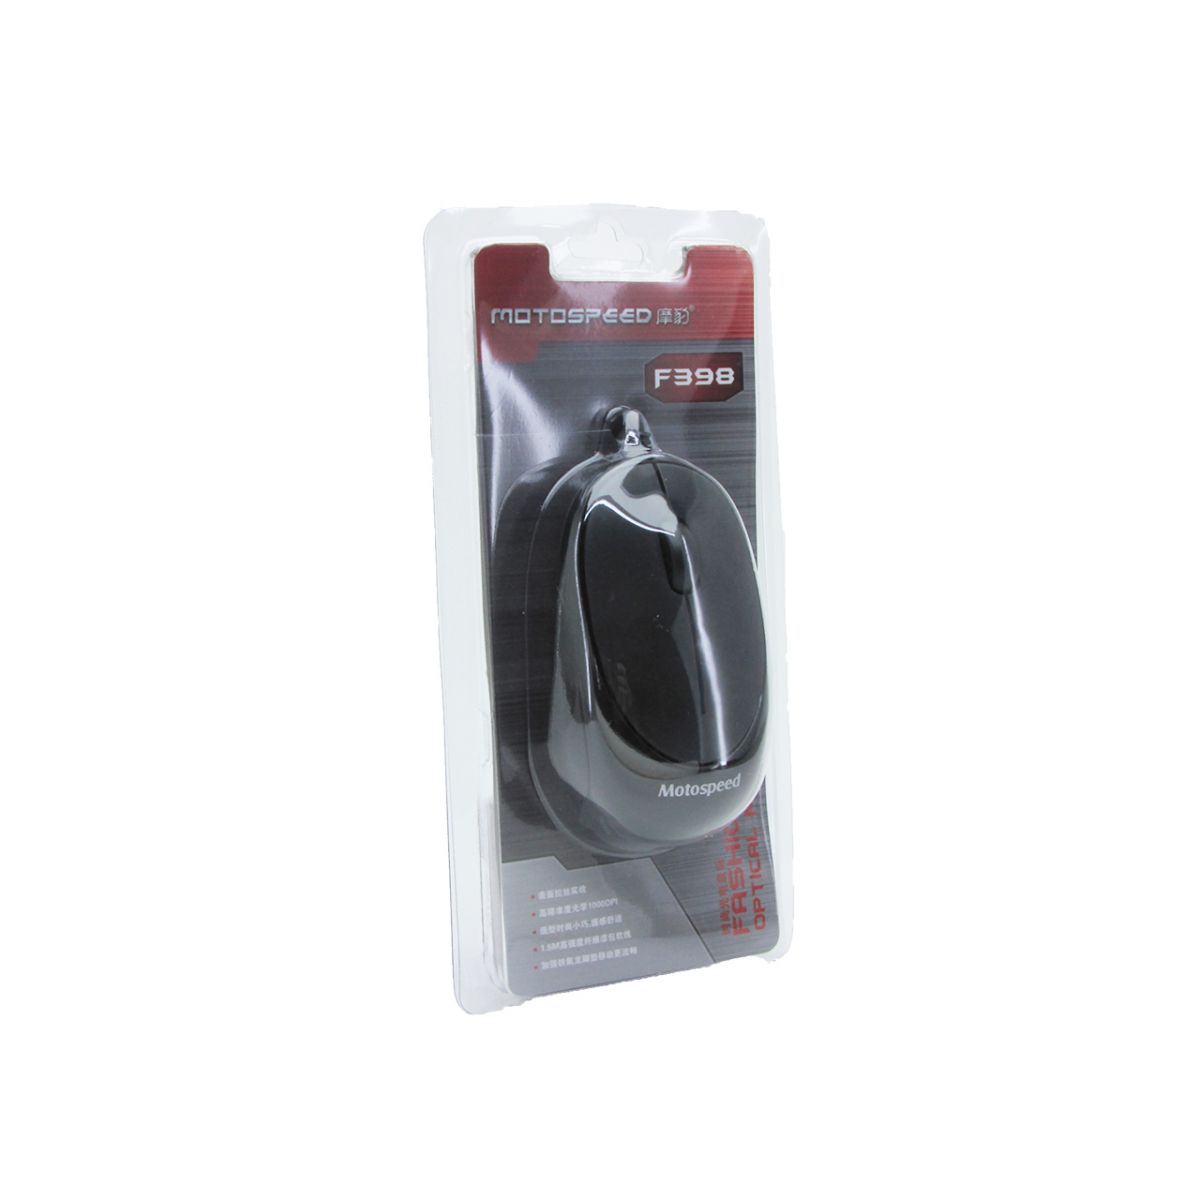 Mouse Óptico 3D F398 Motospeed